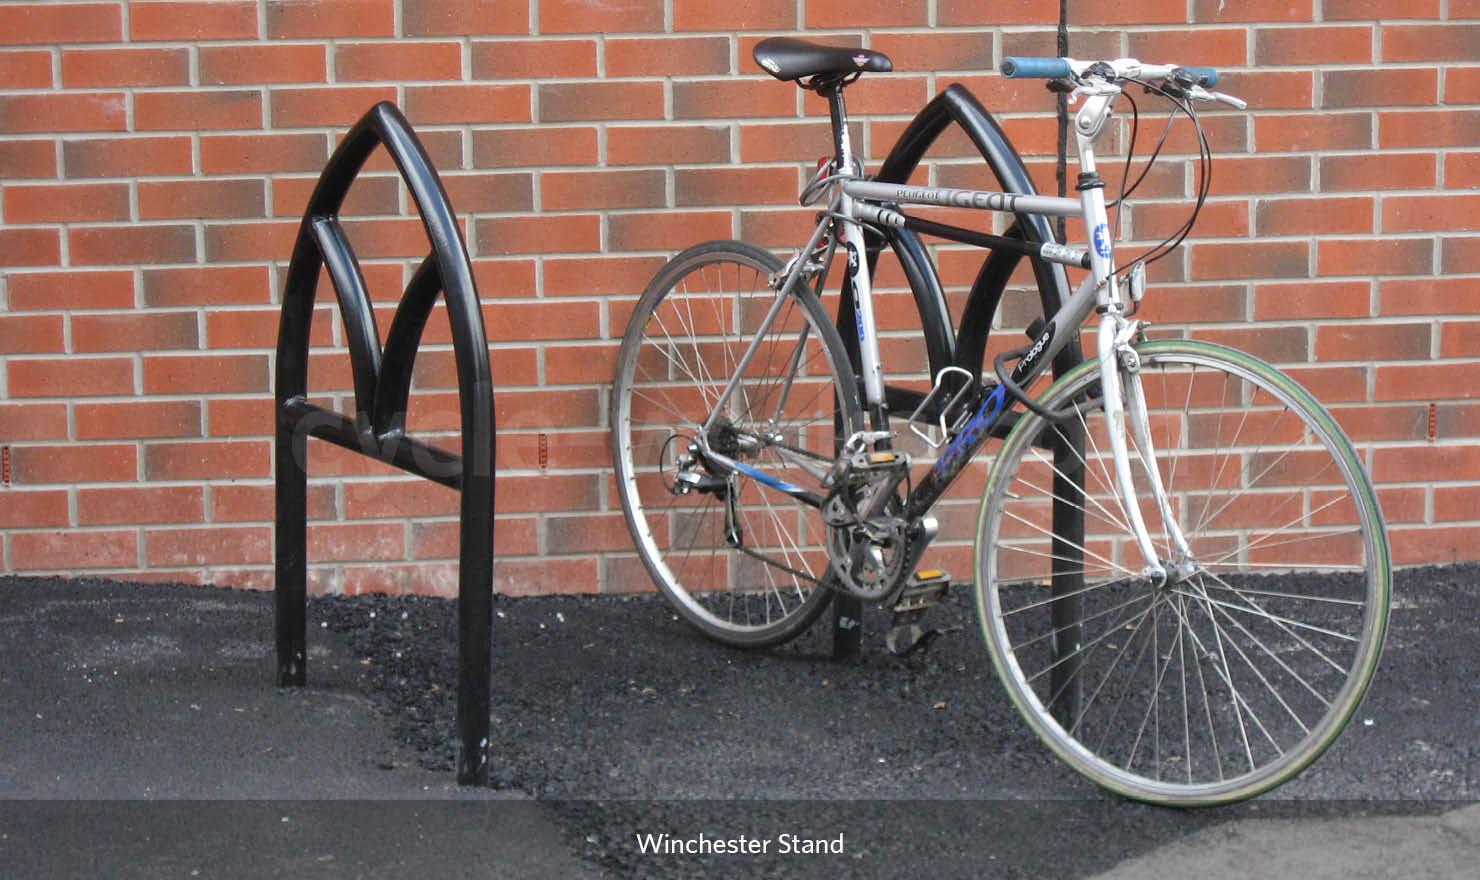 Winchester Bike Rack